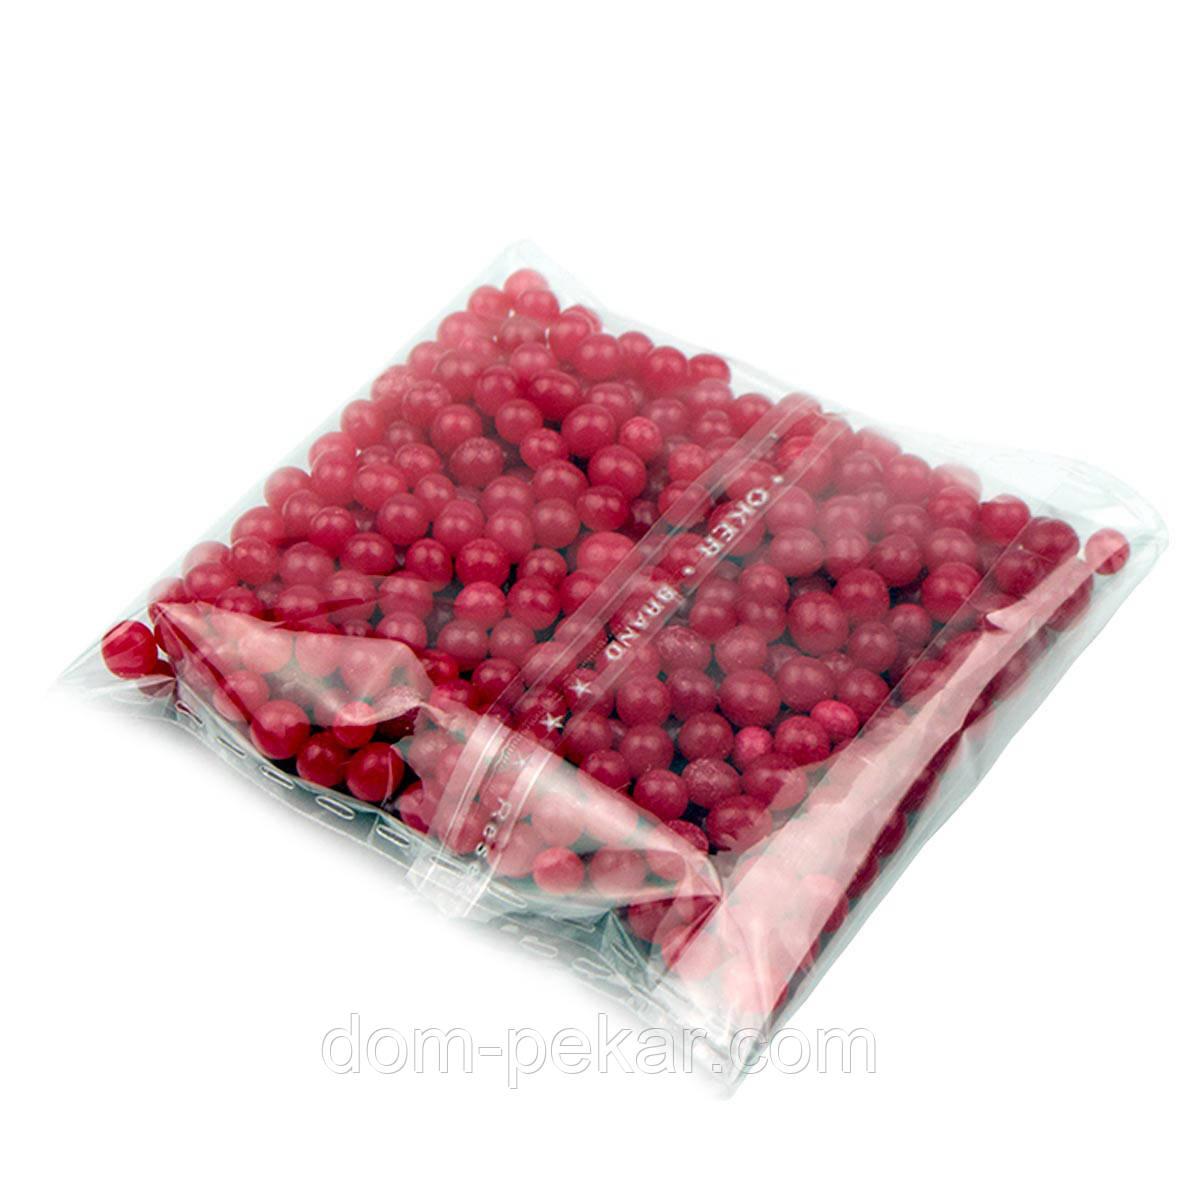 Бусинки сахарные Жемчуг ярко-красный 4 мм (25 гр.)